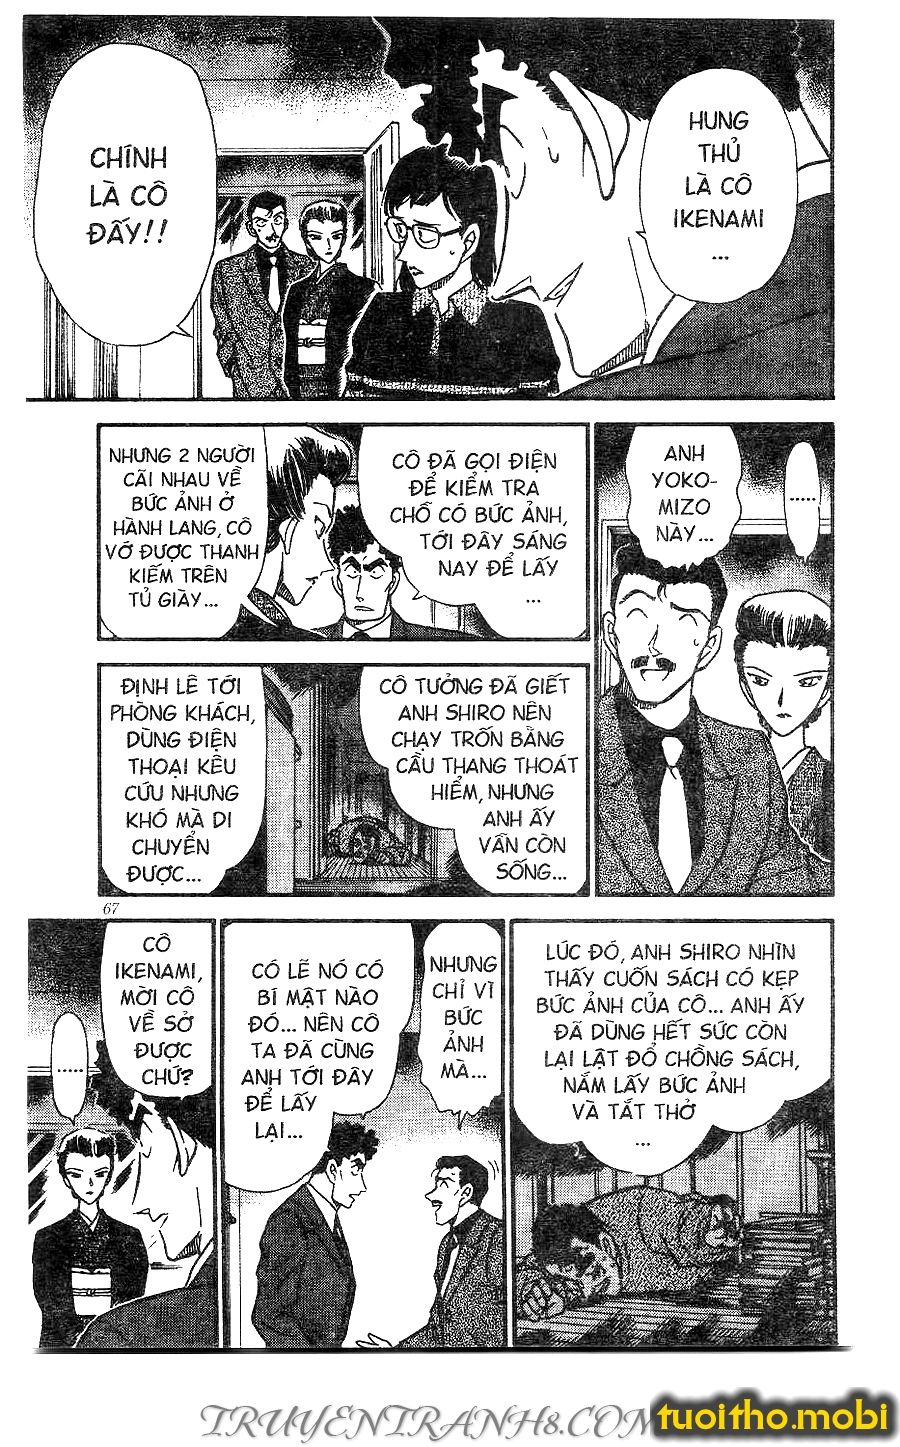 conan chương 277 trang 12